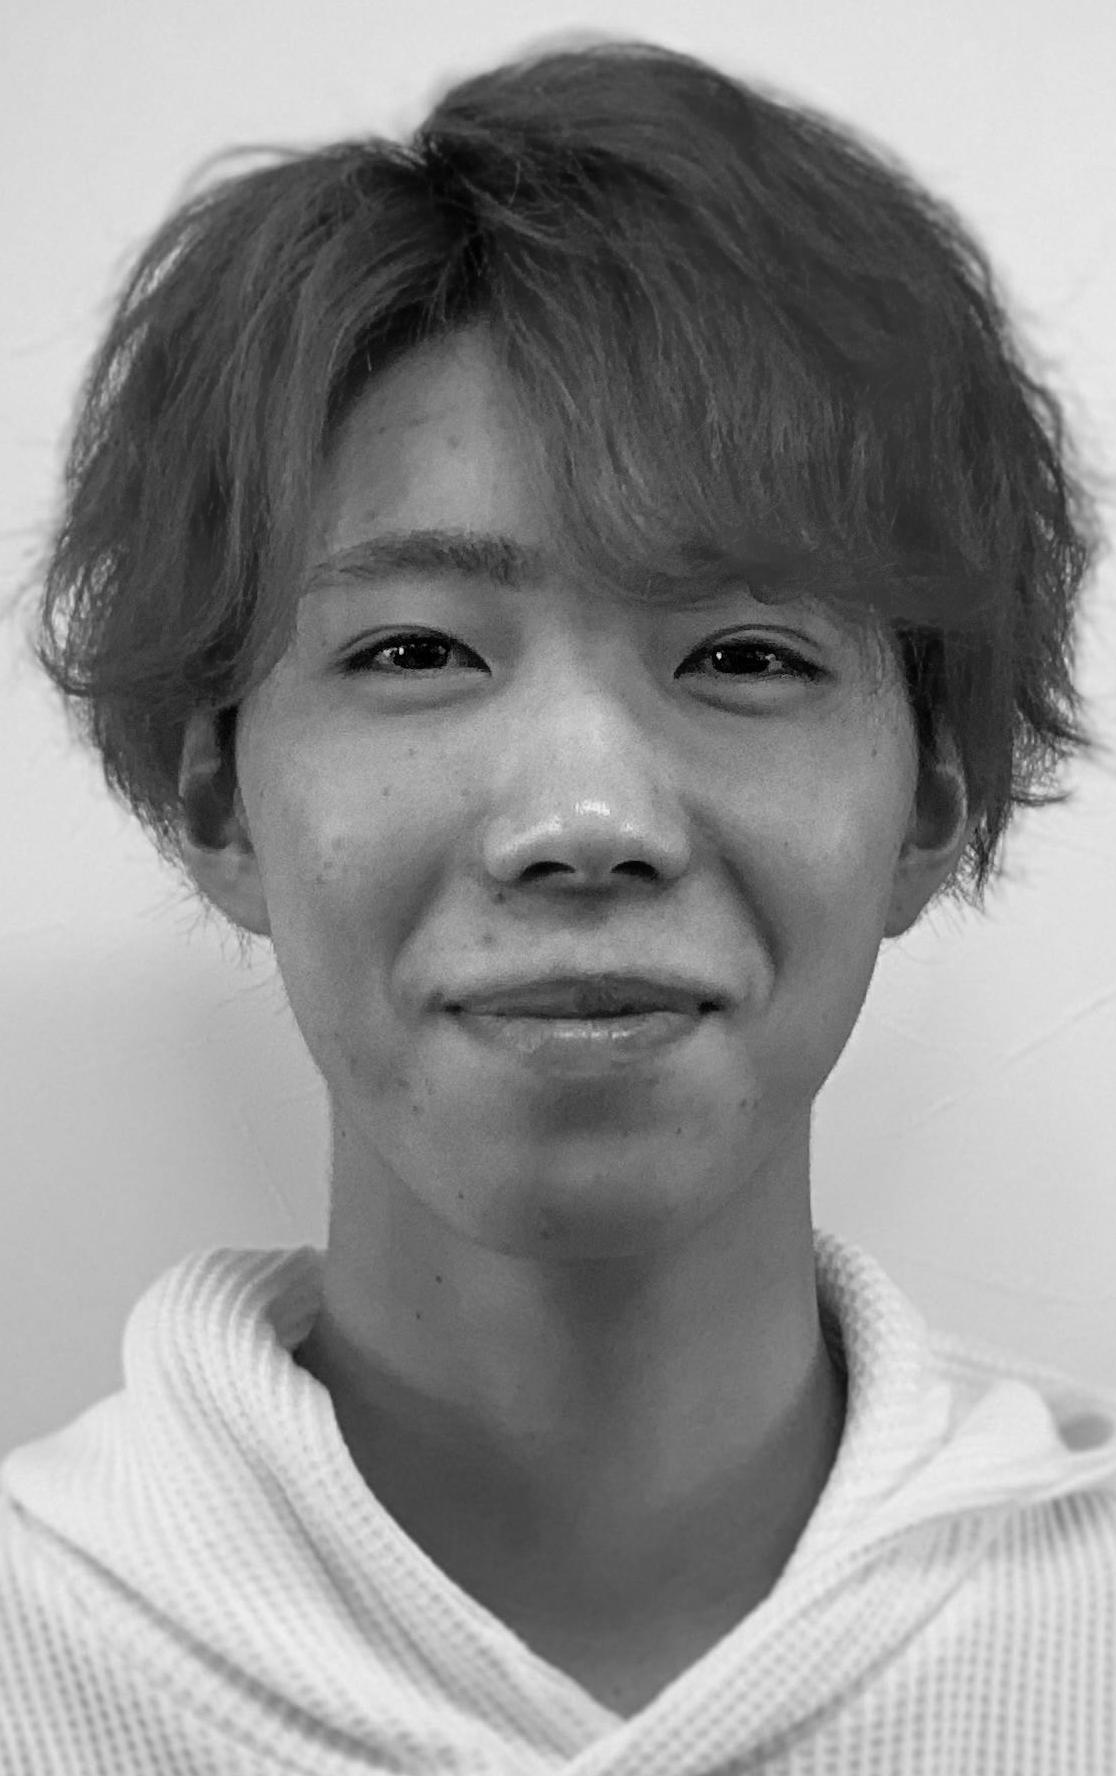 Kiryu Sugawara